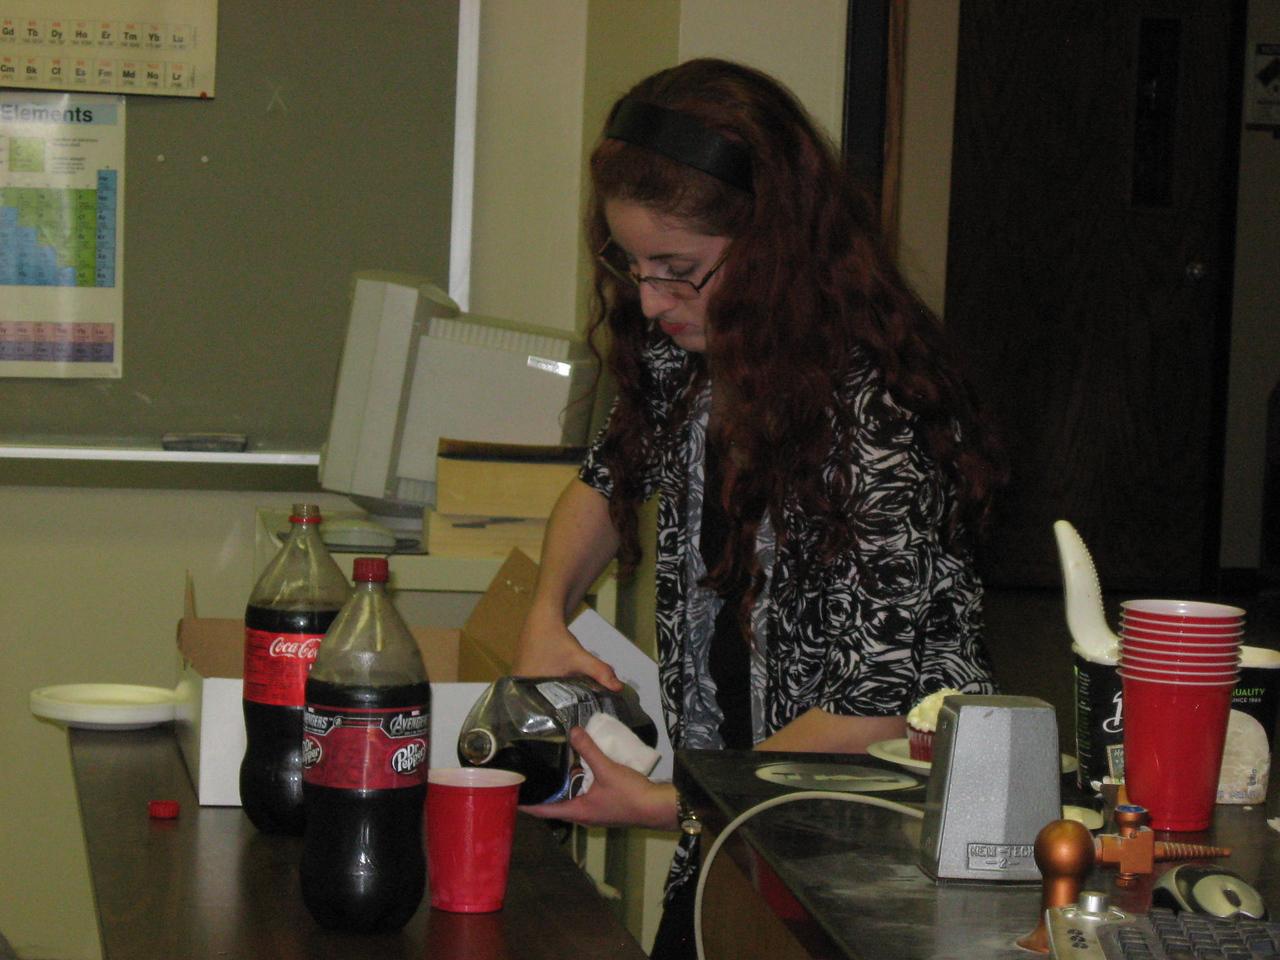 Michelle DuBois making a soda float.